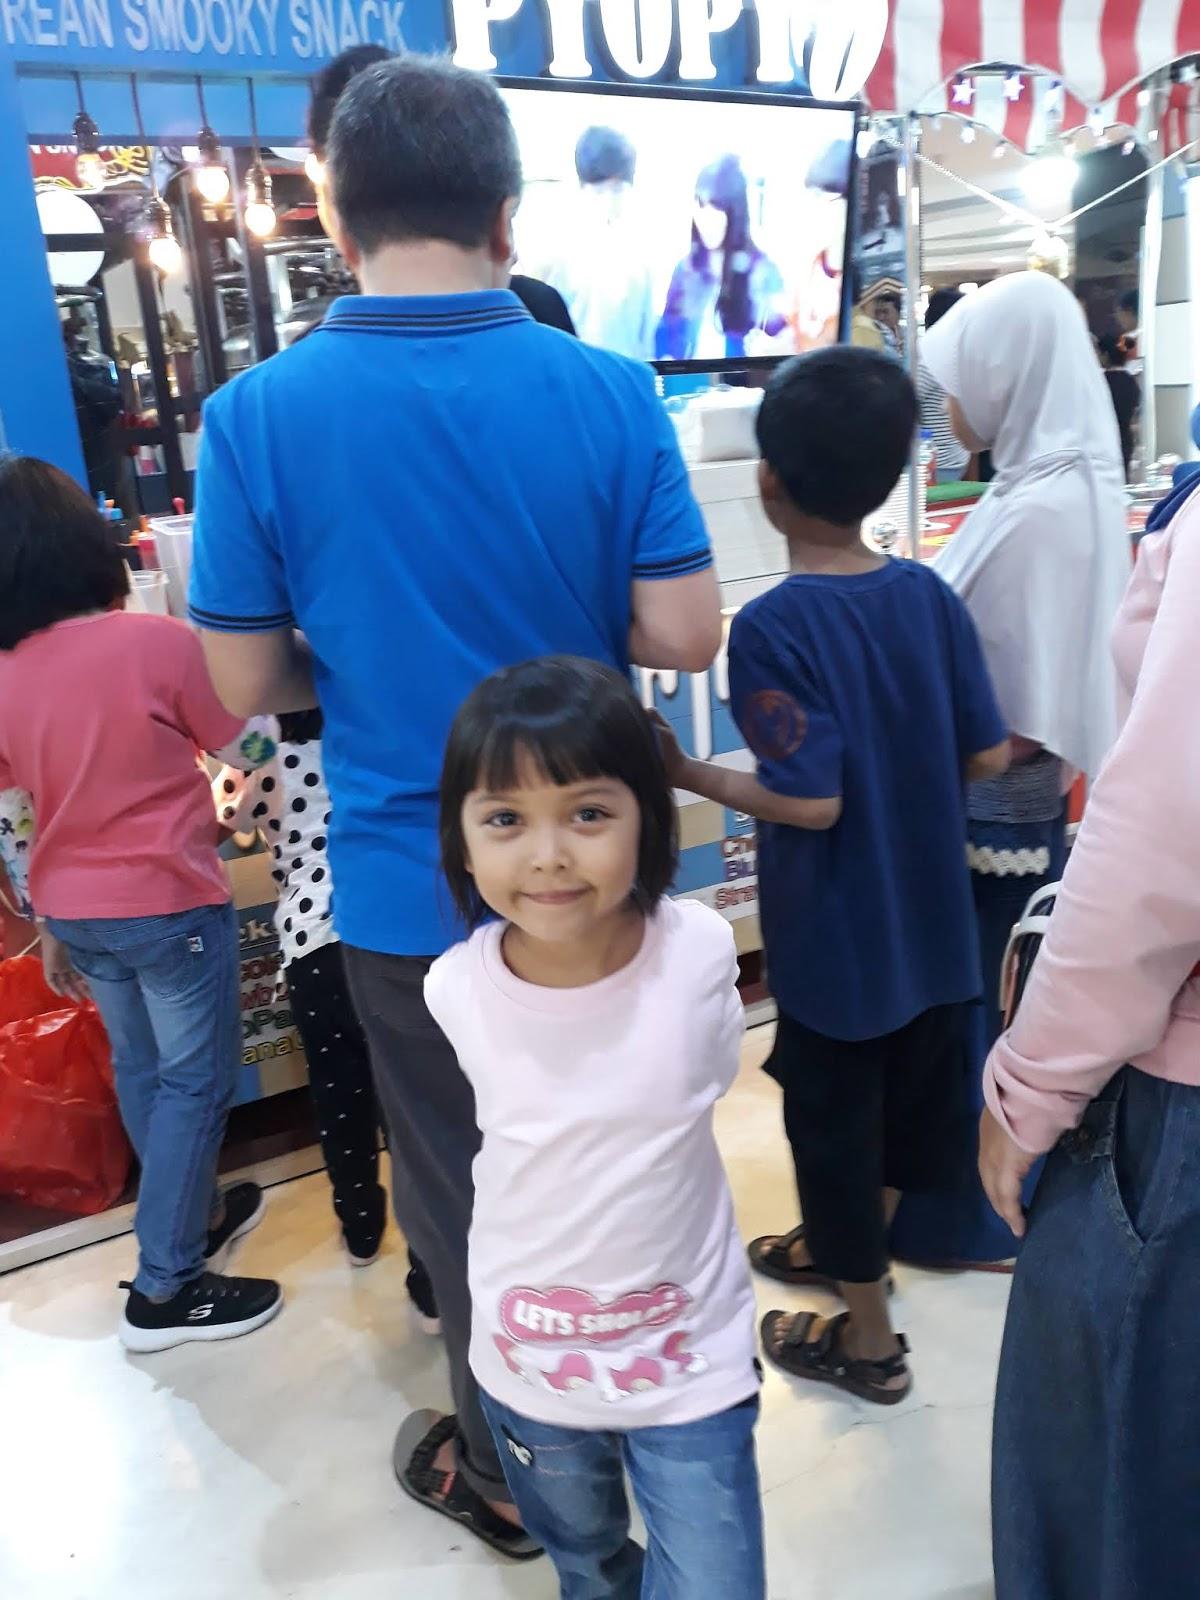 Pyopyo Korean Smooky Snack Cibinong City Mall Cerita